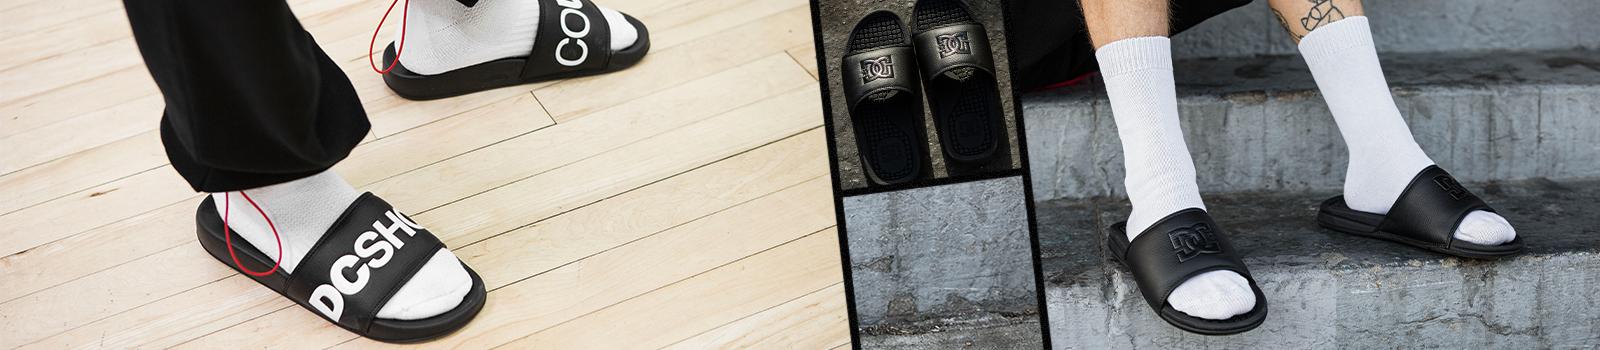 Mens Sandals & Flip Flops from DC Shoes